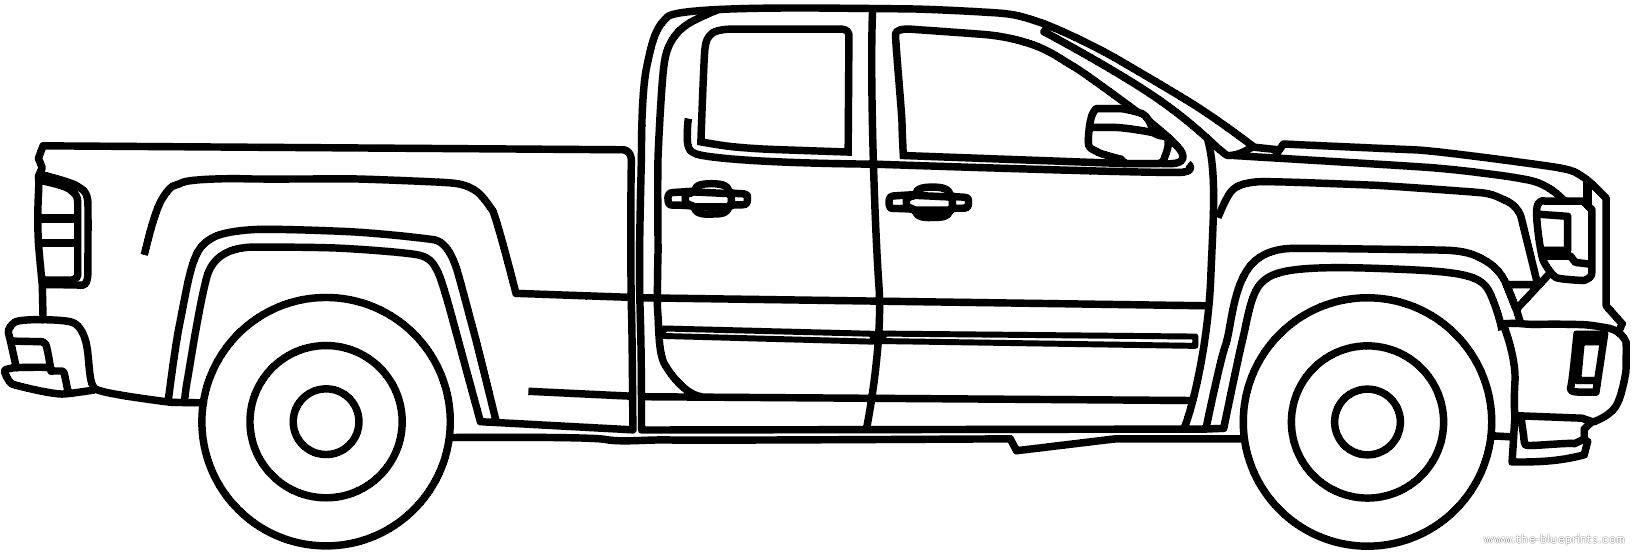 Blueprints > Cars > GMC > GMC Sierra 2500 HD EC (2015)